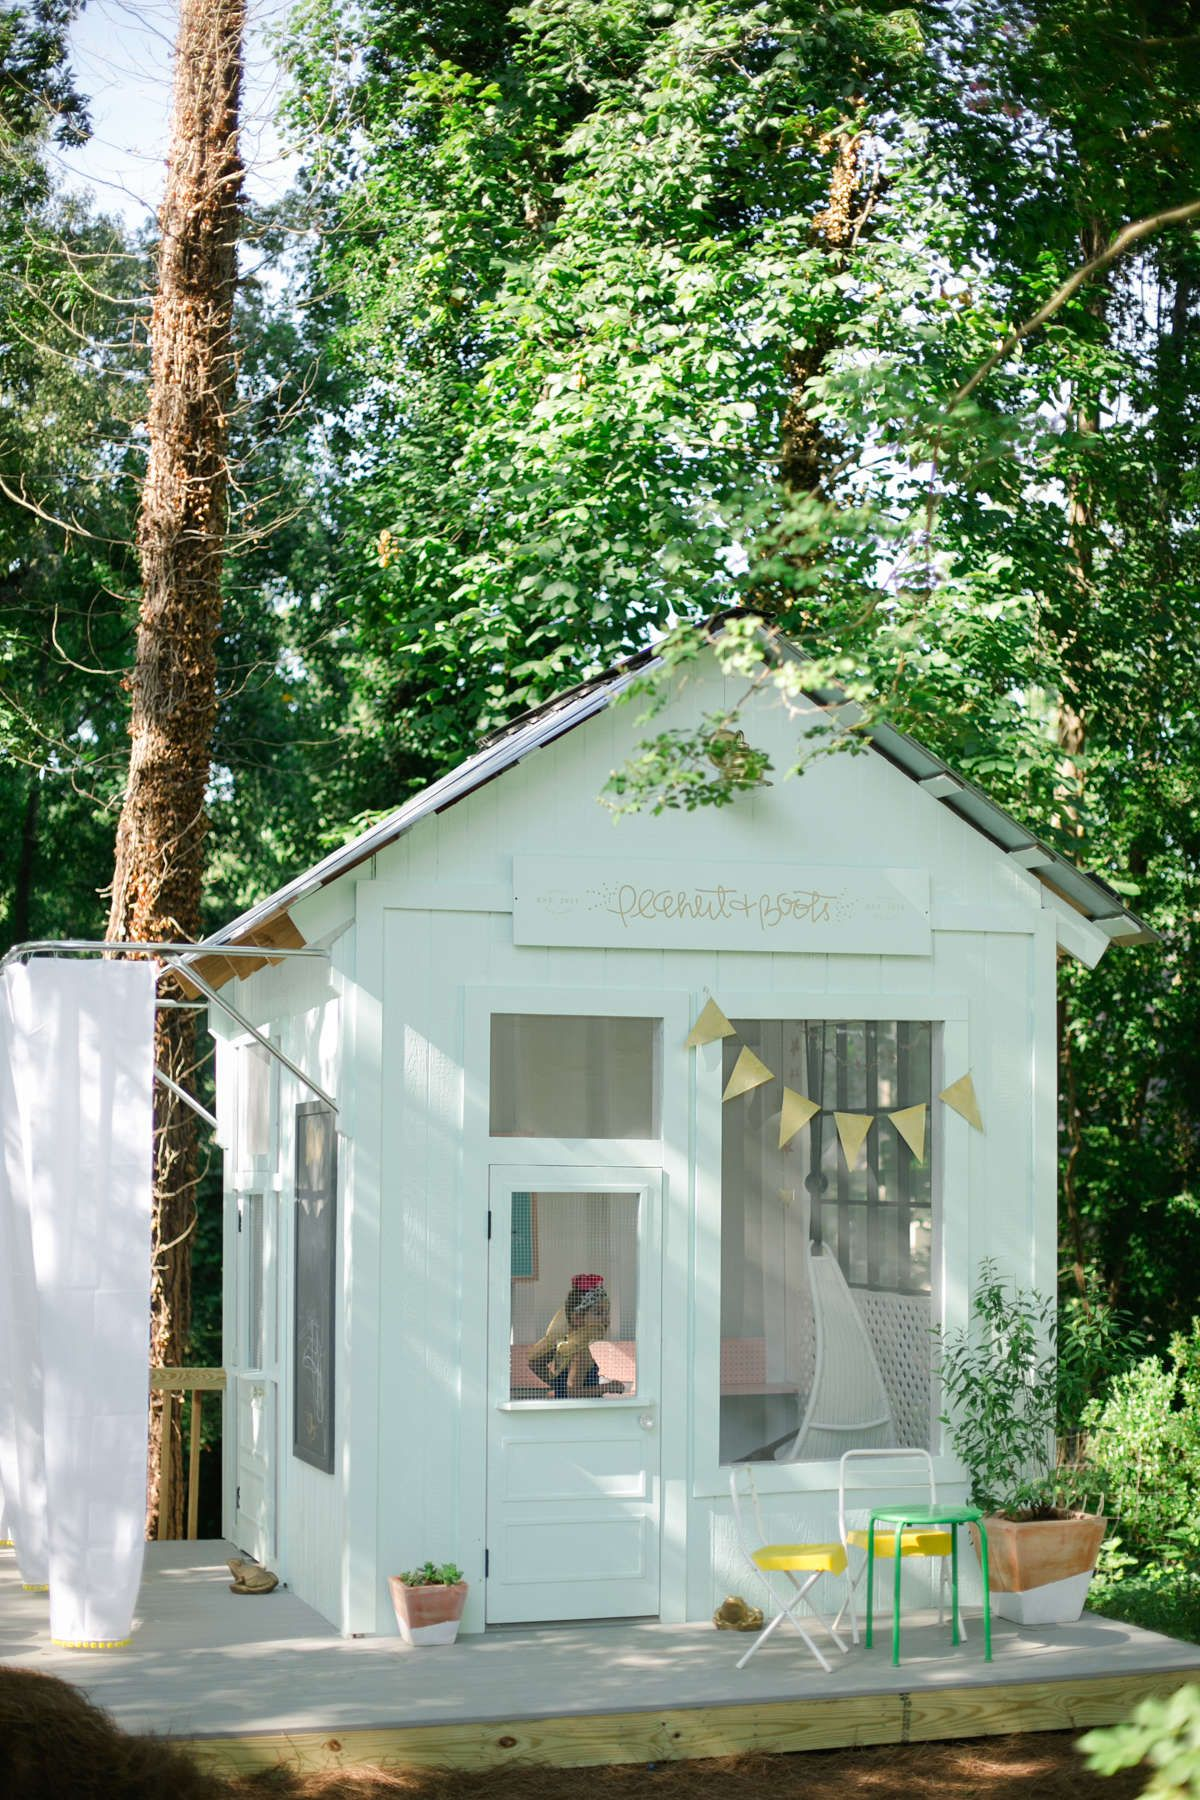 playhouse ideas - Playhouse Designs And Ideas